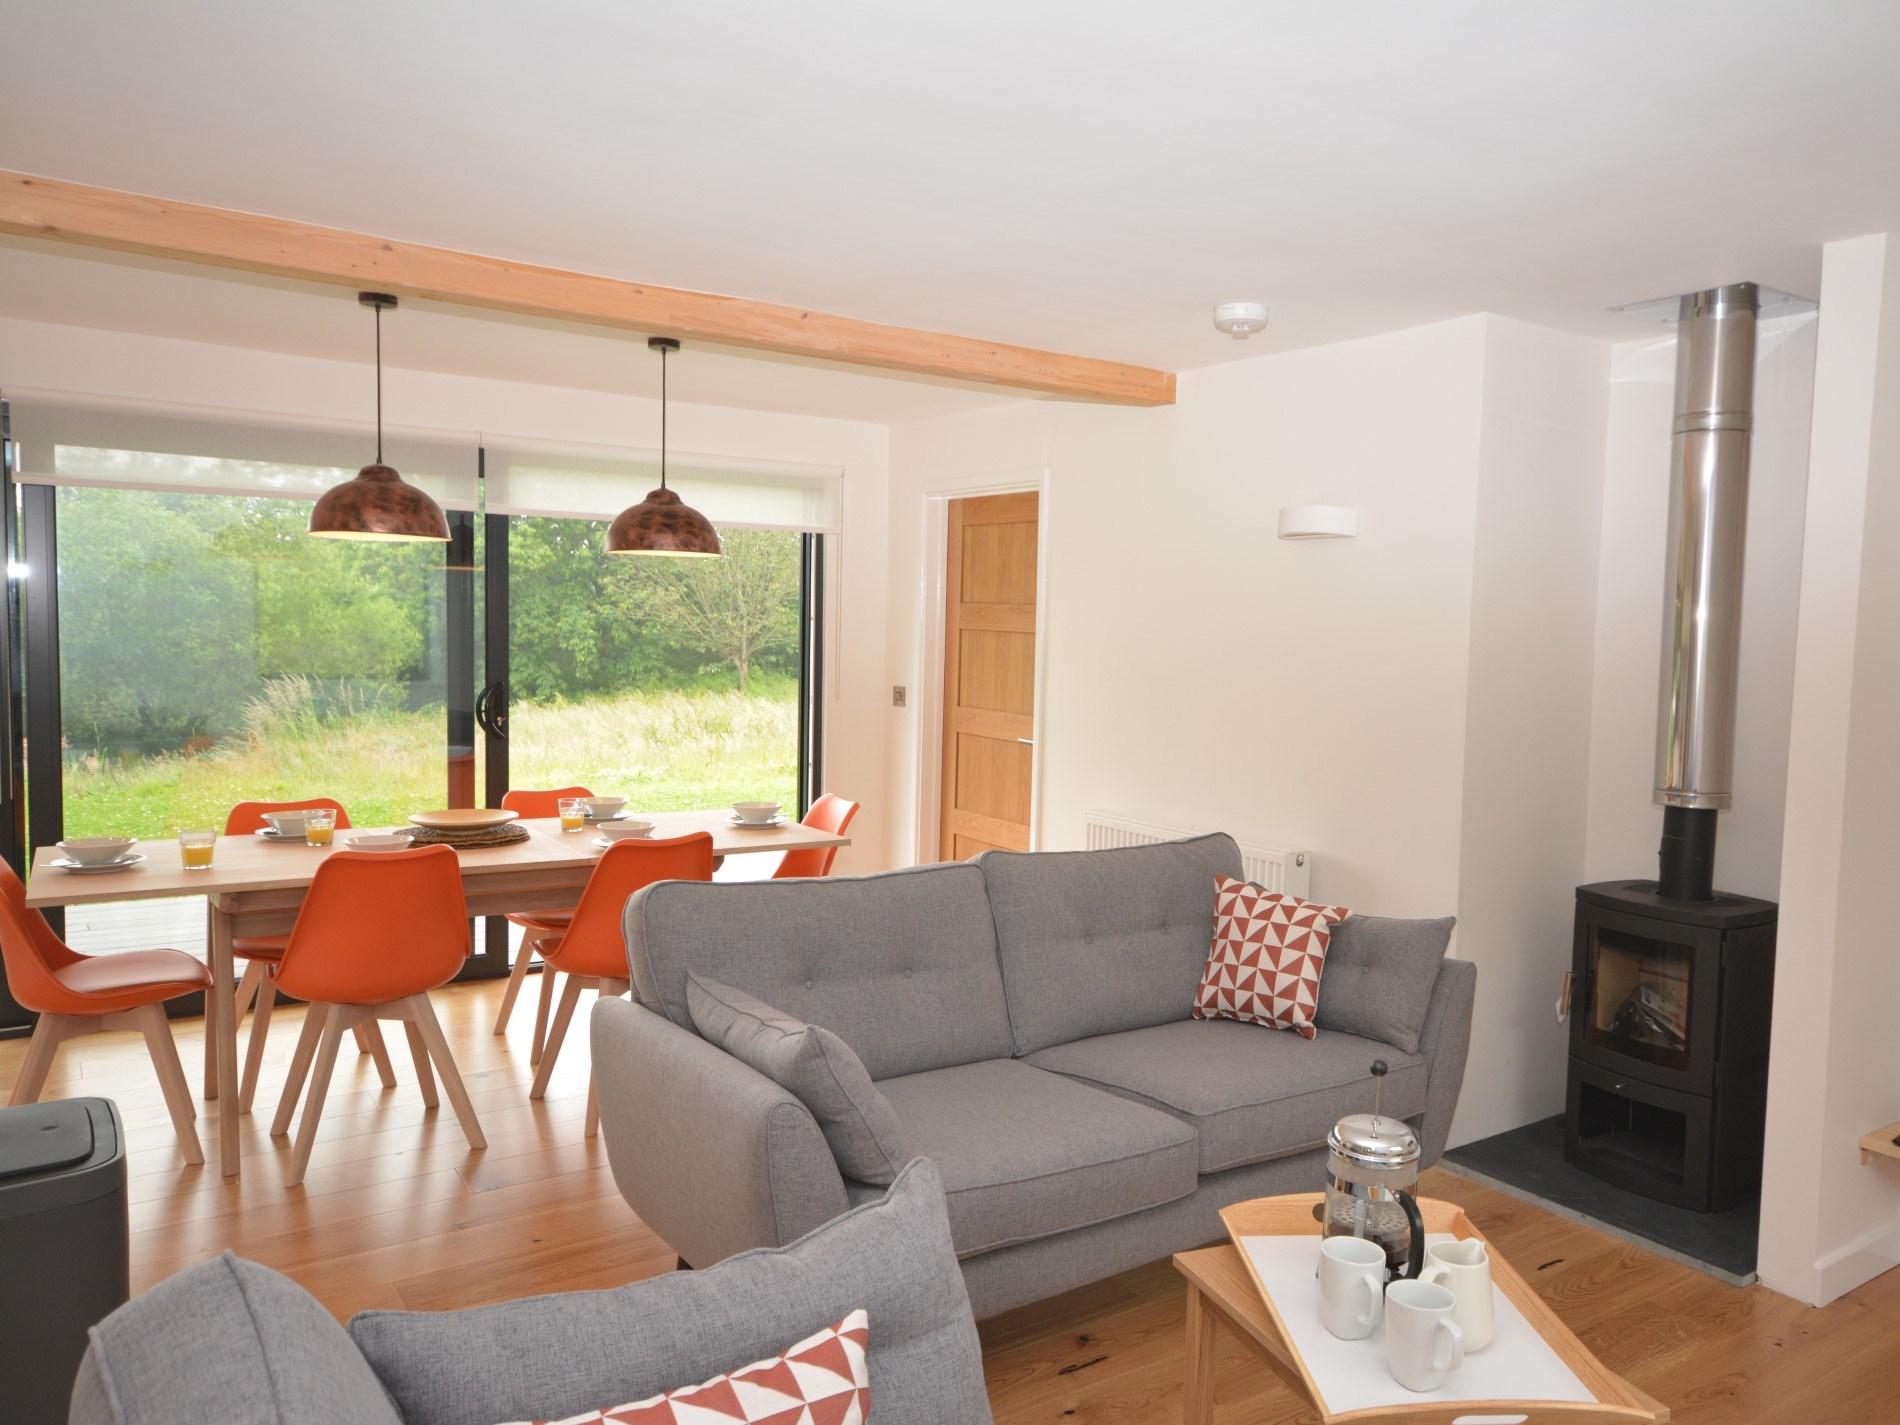 3 Bedroom Log Cabin in Mid and East Devon, Devon